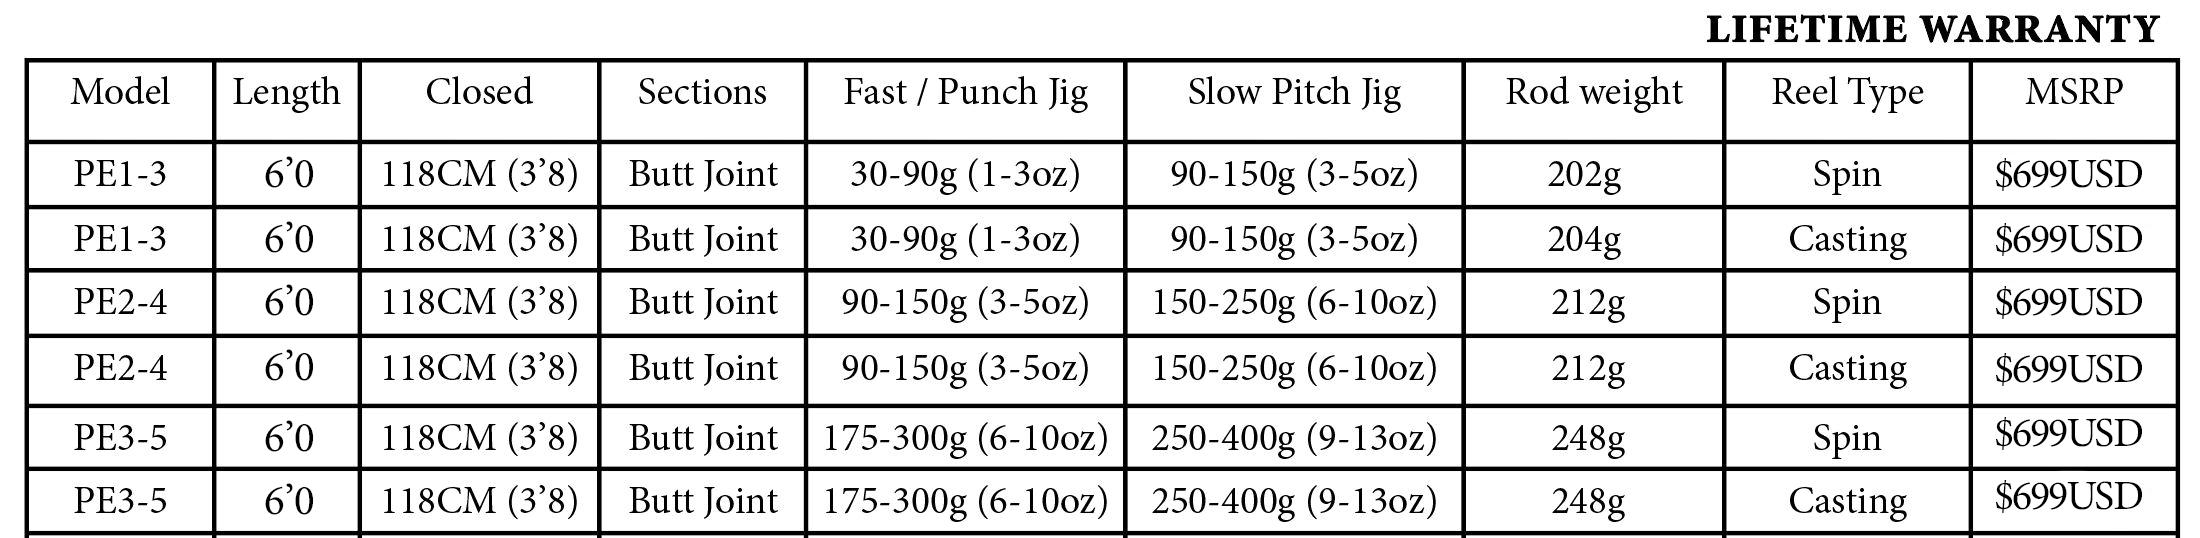 slow-fast-xos-2020-21.jpg